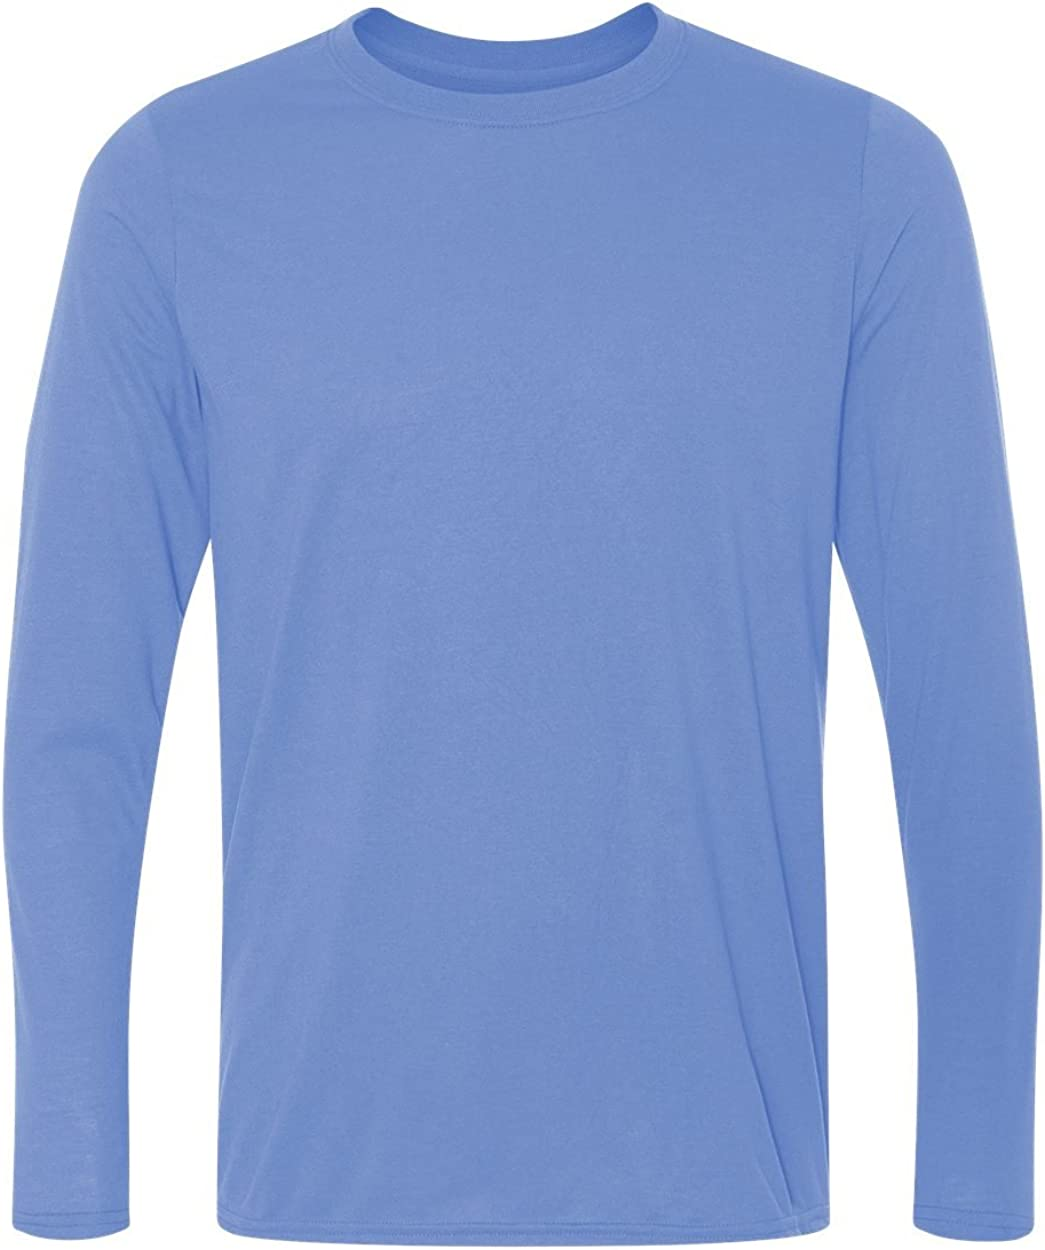 Gildan 42400 Adult Core Performance Long-Sleeve T-Shirt